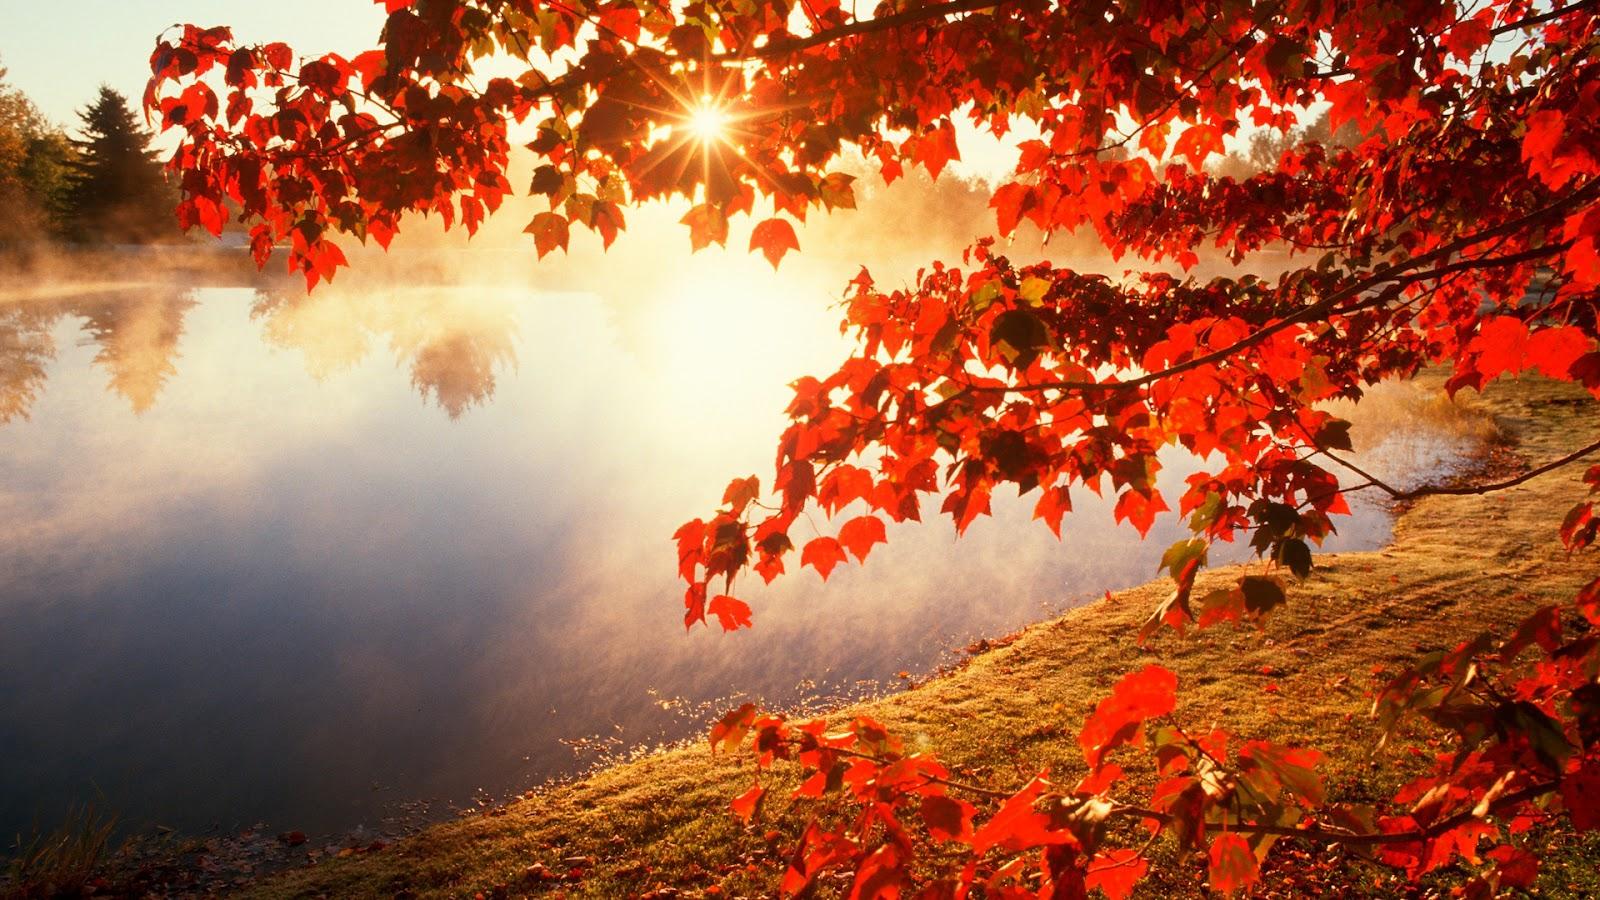 http://3.bp.blogspot.com/-efwbgwDZC9E/T7W33VOEIjI/AAAAAAAADXI/FVxaFW5dvKM/s1600/Red-autumn-morning.jpg